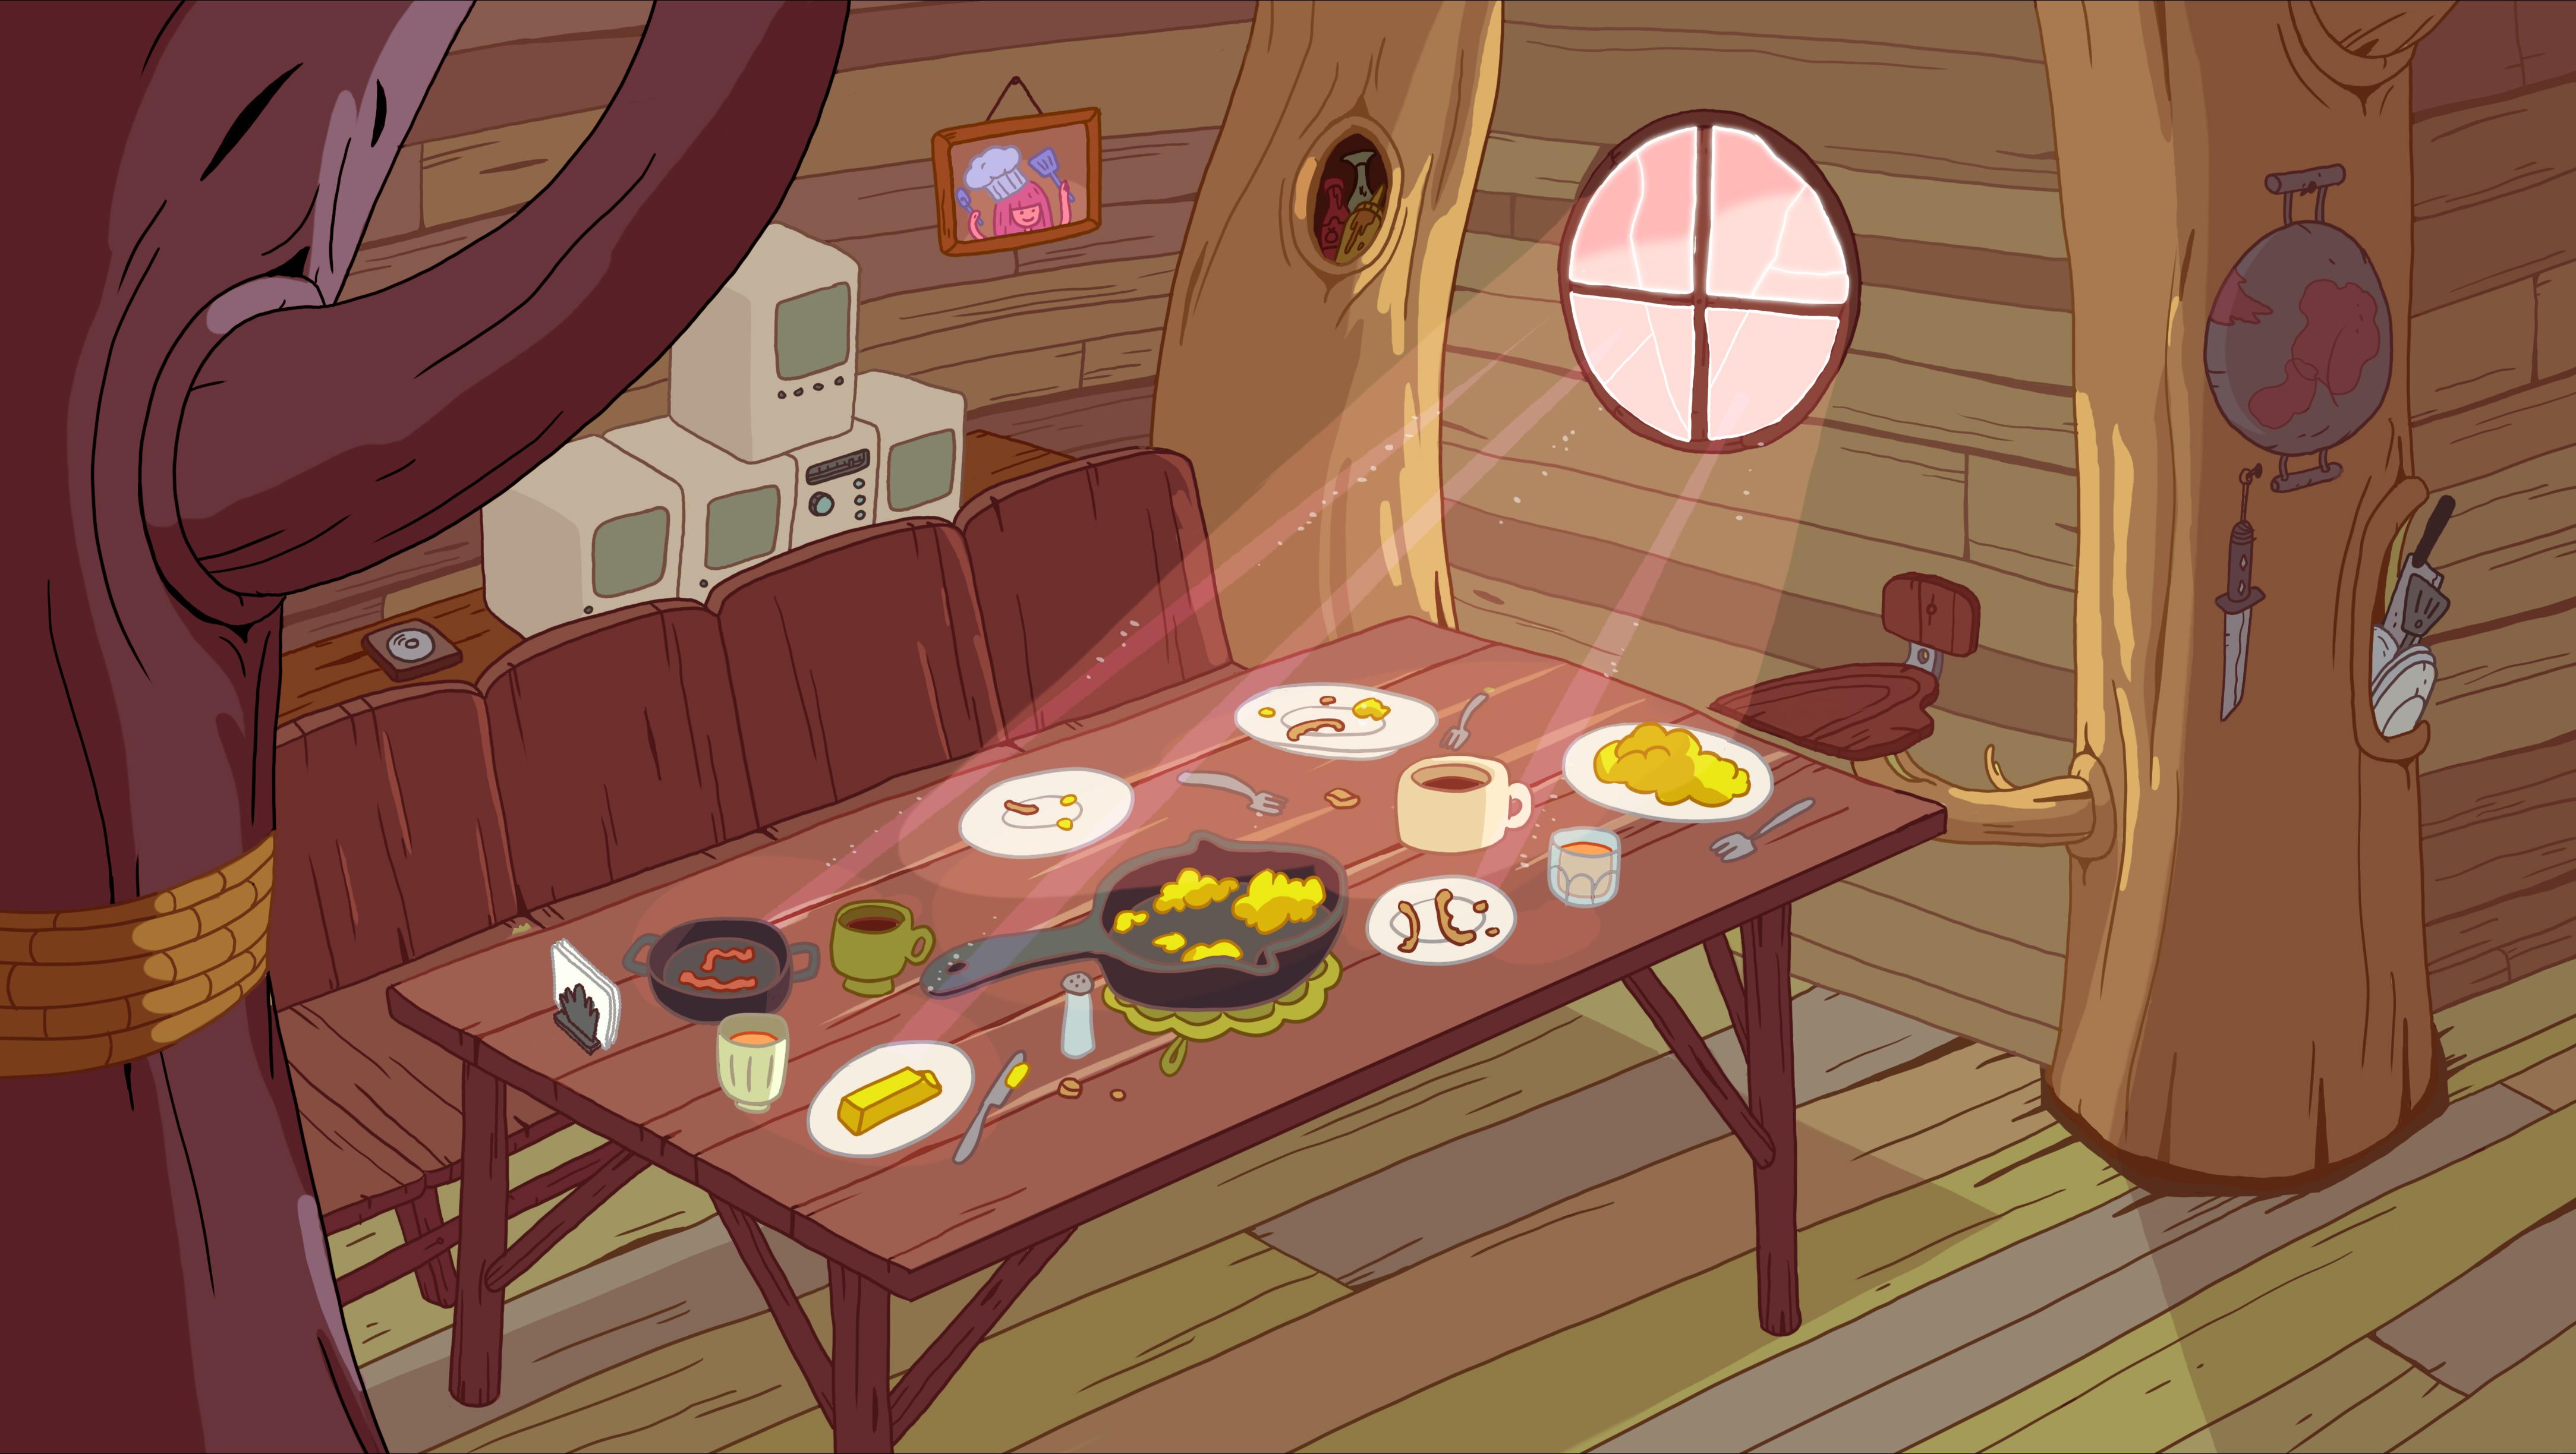 Adventure Time Sfondi per PC  4334x2447  ID221064